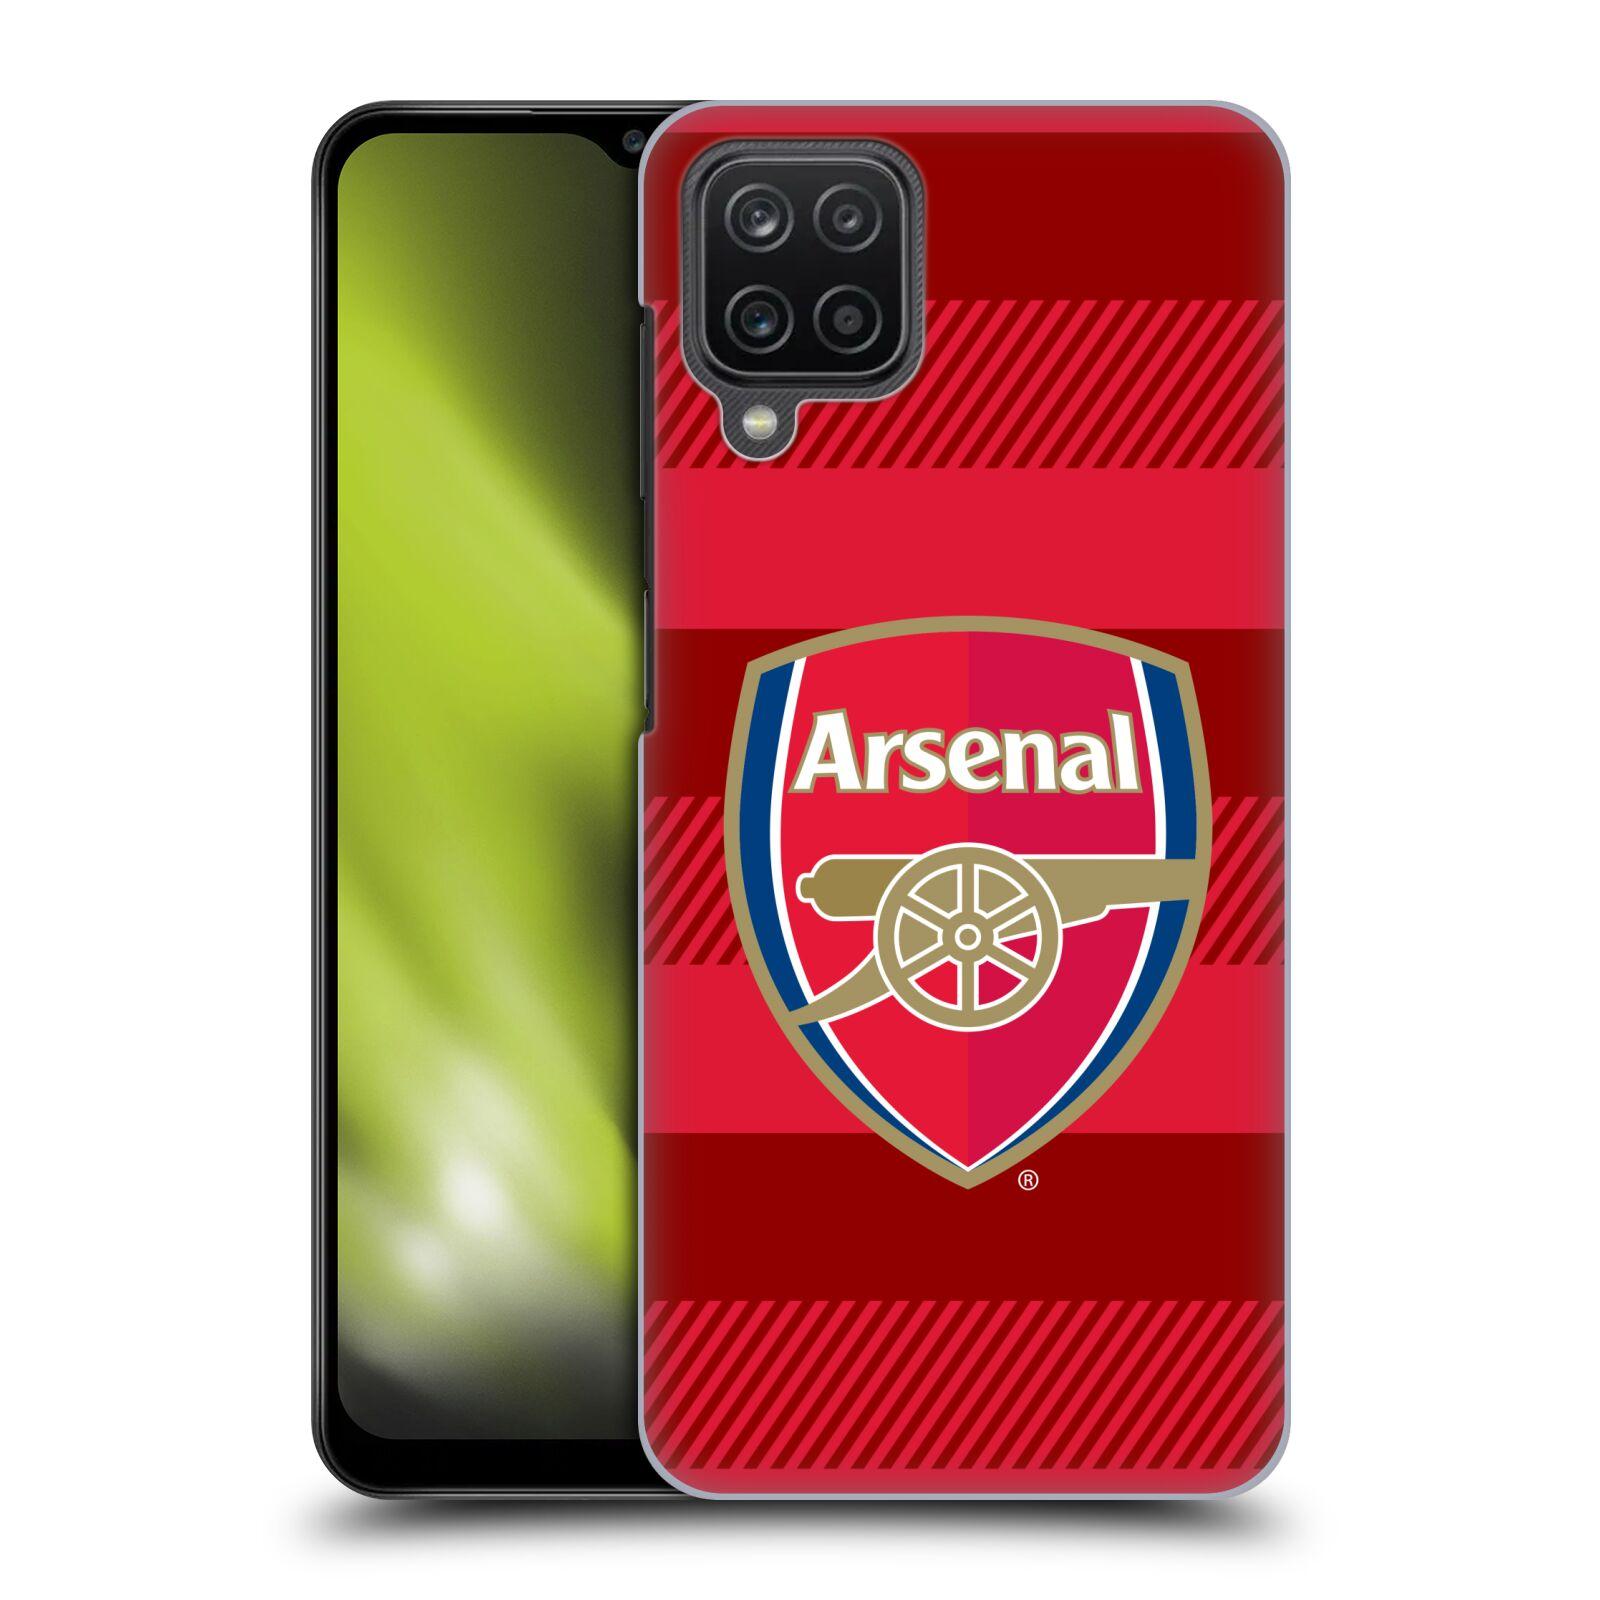 Plastové pouzdro na mobil Samsung Galaxy A12 - Head Case - Arsenal FC - Logo s pruhy